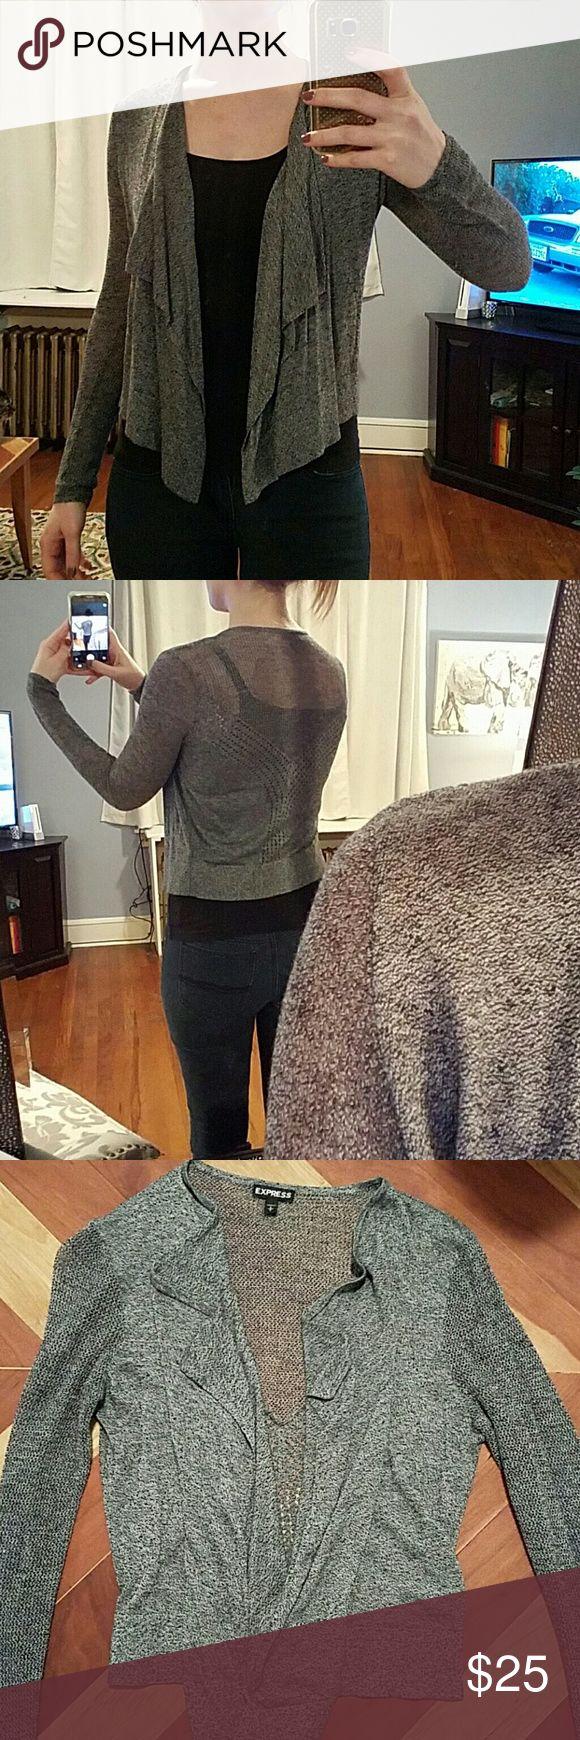 Express Gray Knit Cardigan Express gray knit cardigan. Worn once, no wear.  Has